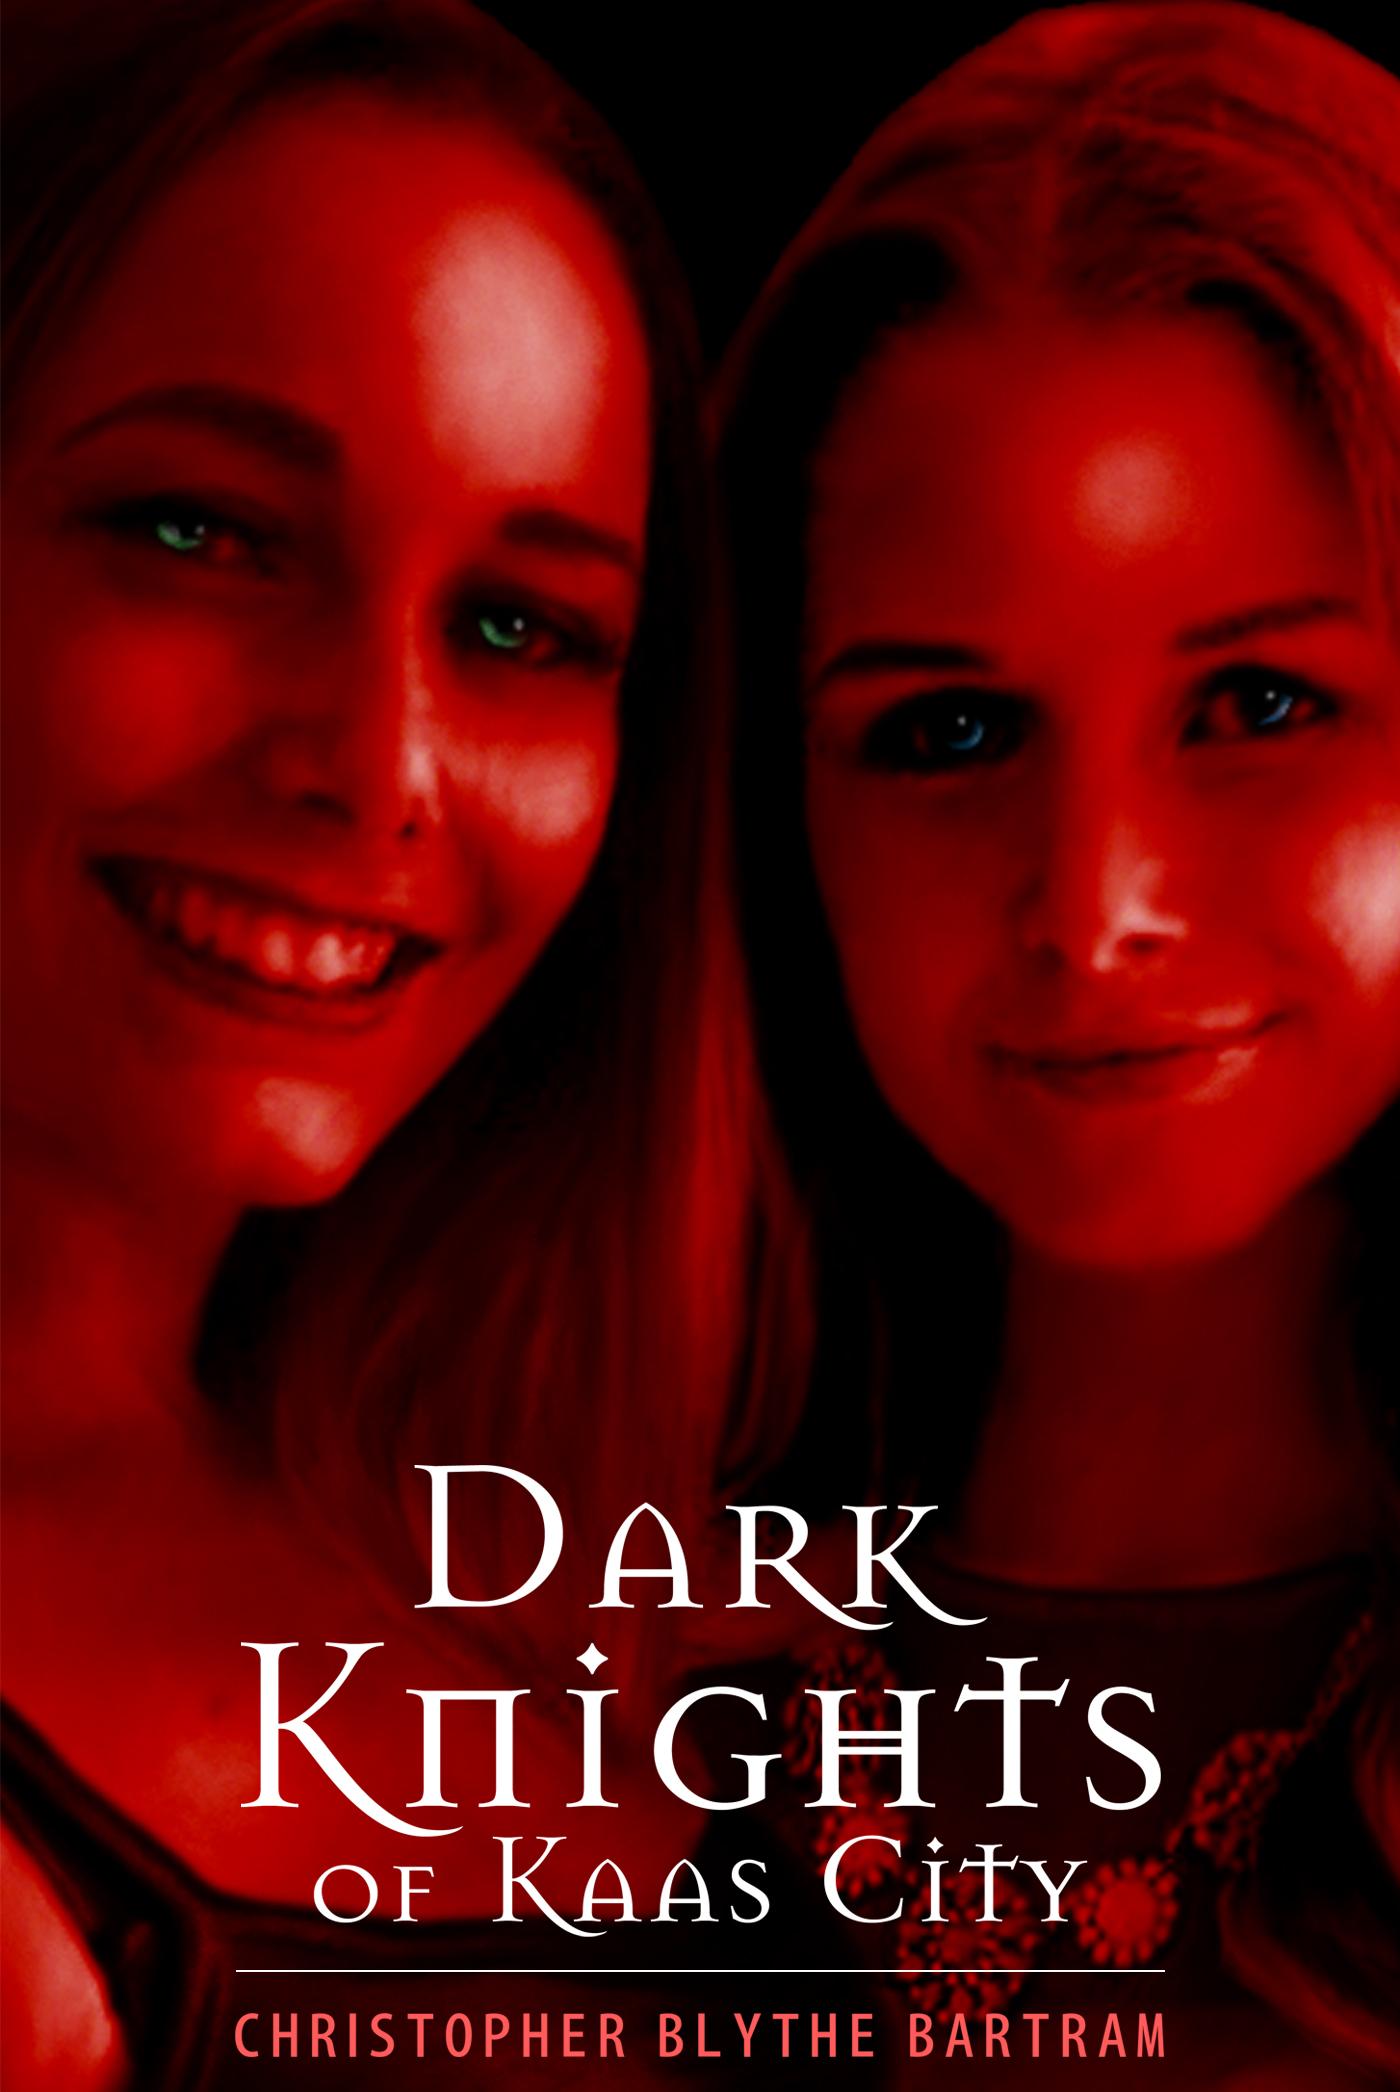 Dark Knights of Kaas City (Dark Knights #2)